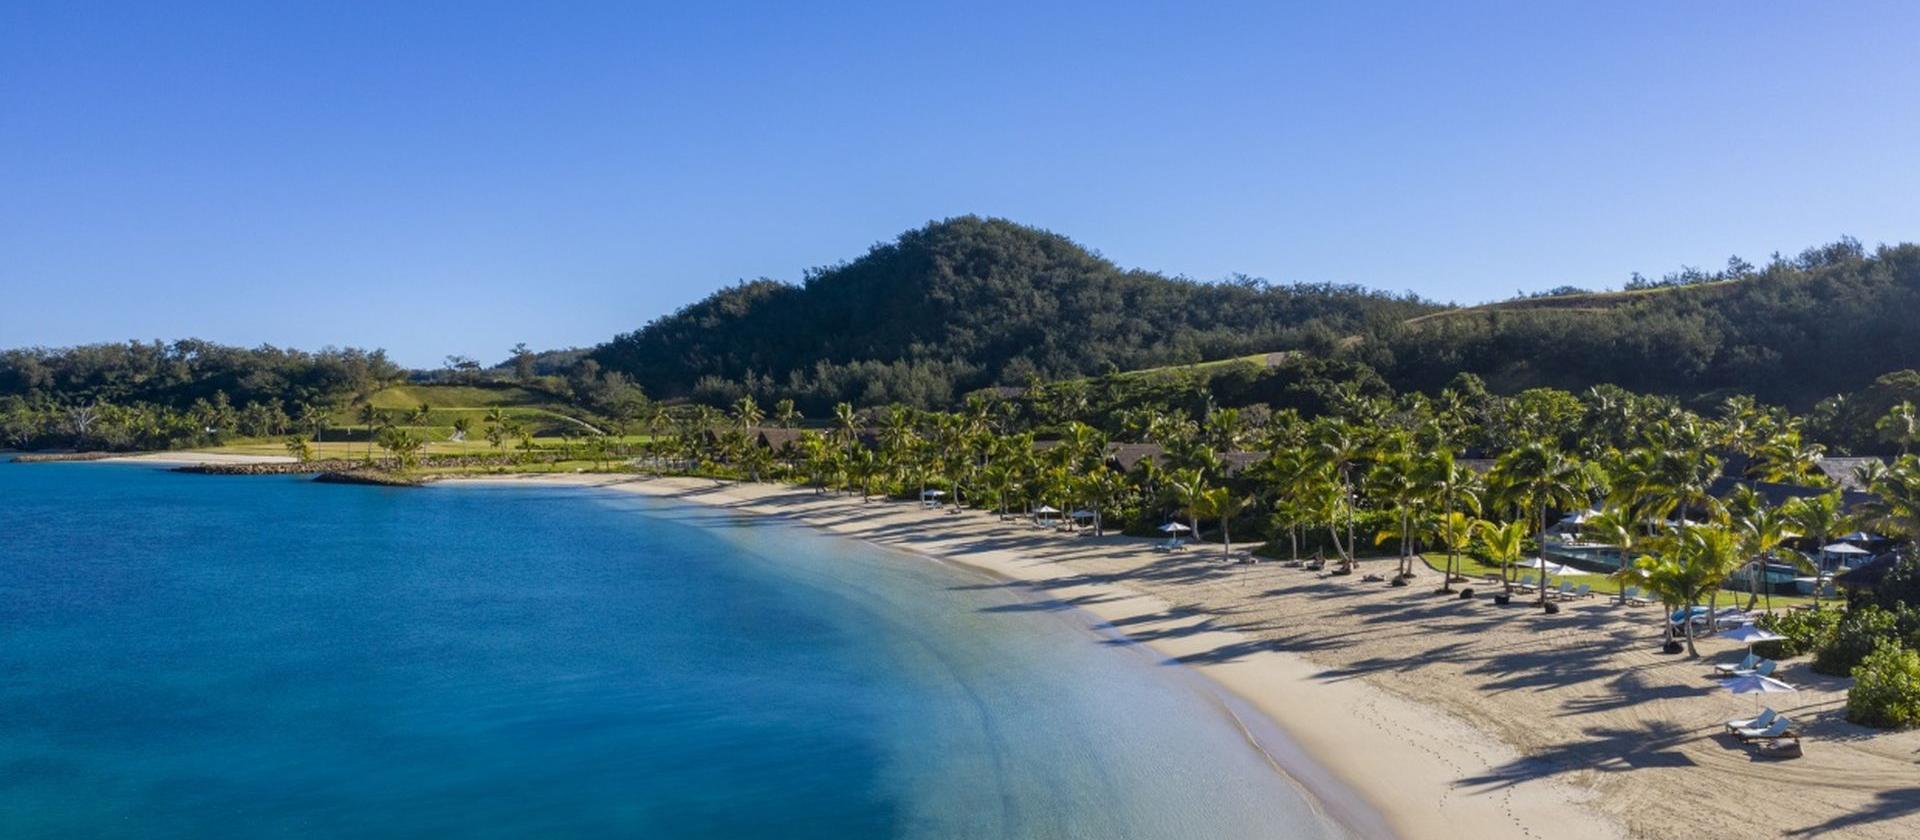 Fidzsi-szigeteki (Fiji) utazások